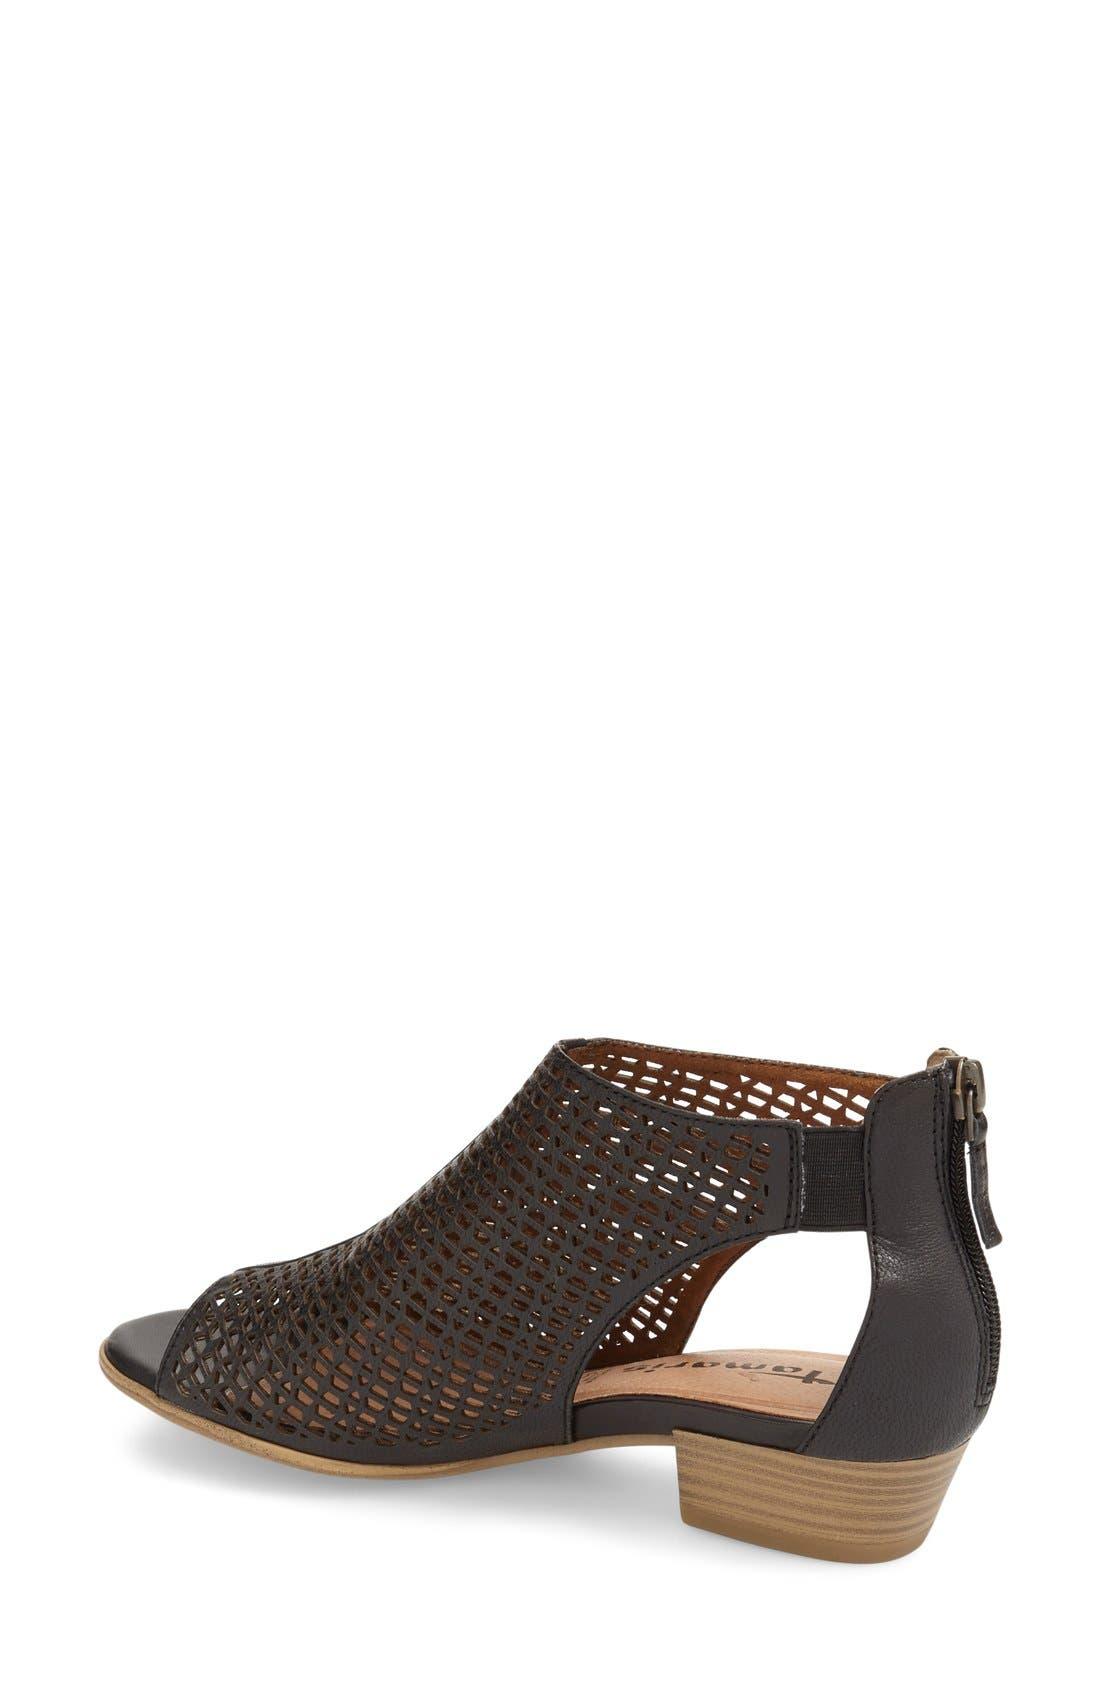 'Nao' Open Toe Sandal,                             Alternate thumbnail 2, color,                             Black Leather